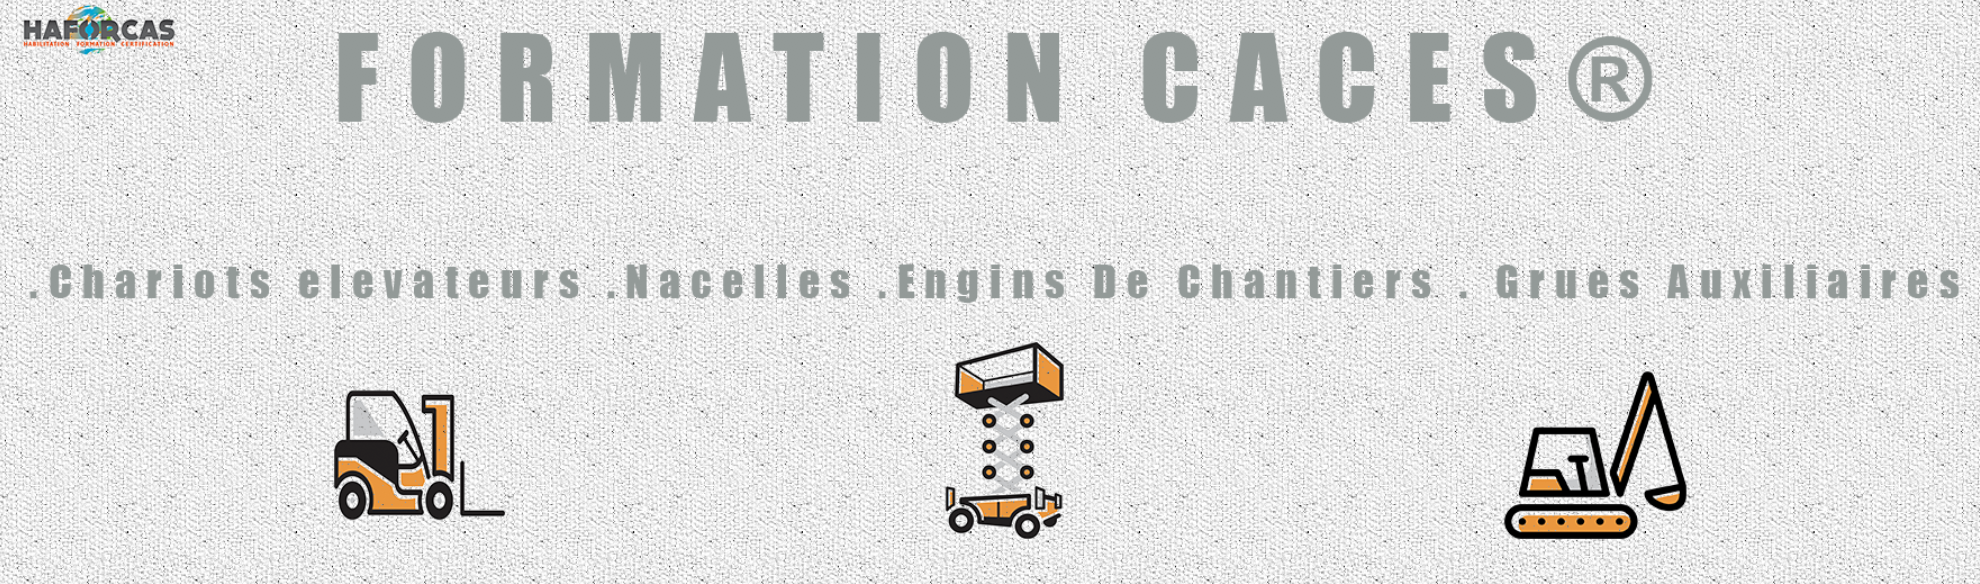 Formation CACES® HAFORCAS Formation